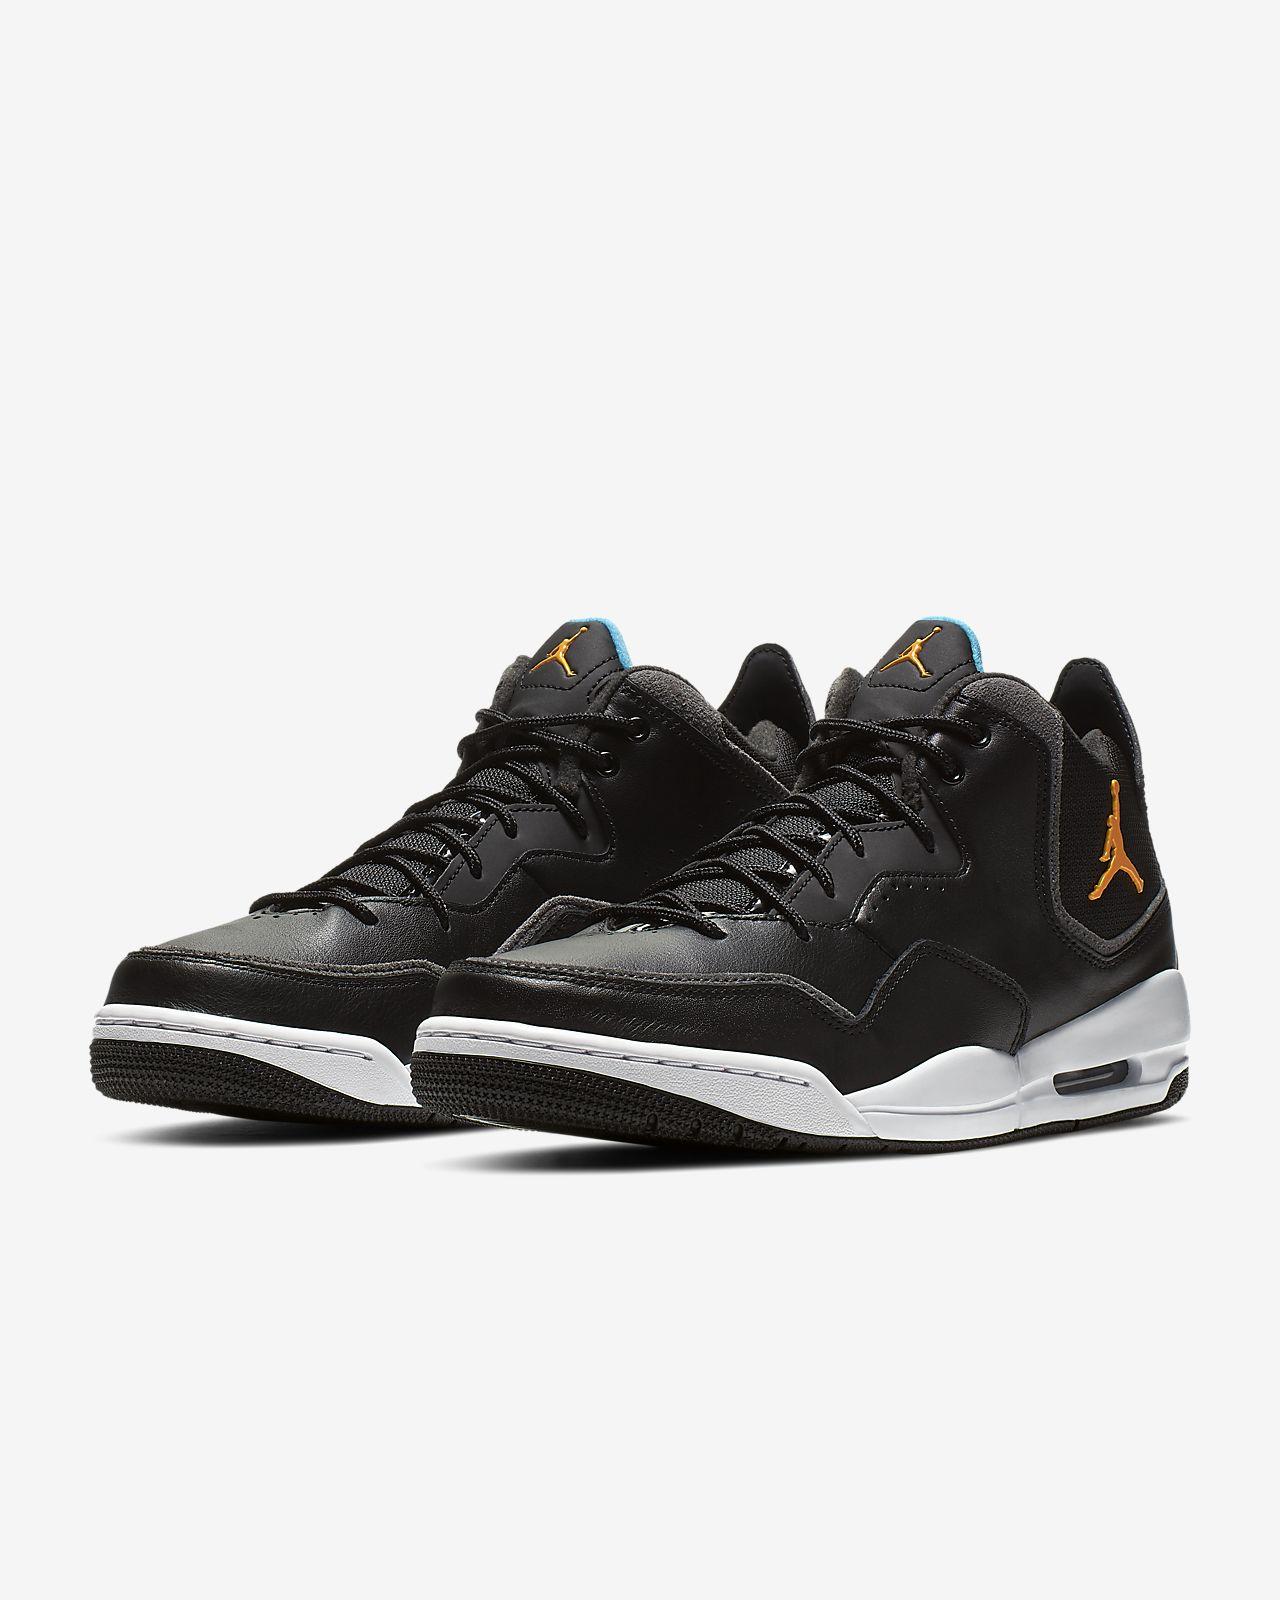 34bdbc0b46fa3c Jordan Courtside 23 Men s Shoe. Nike.com GB